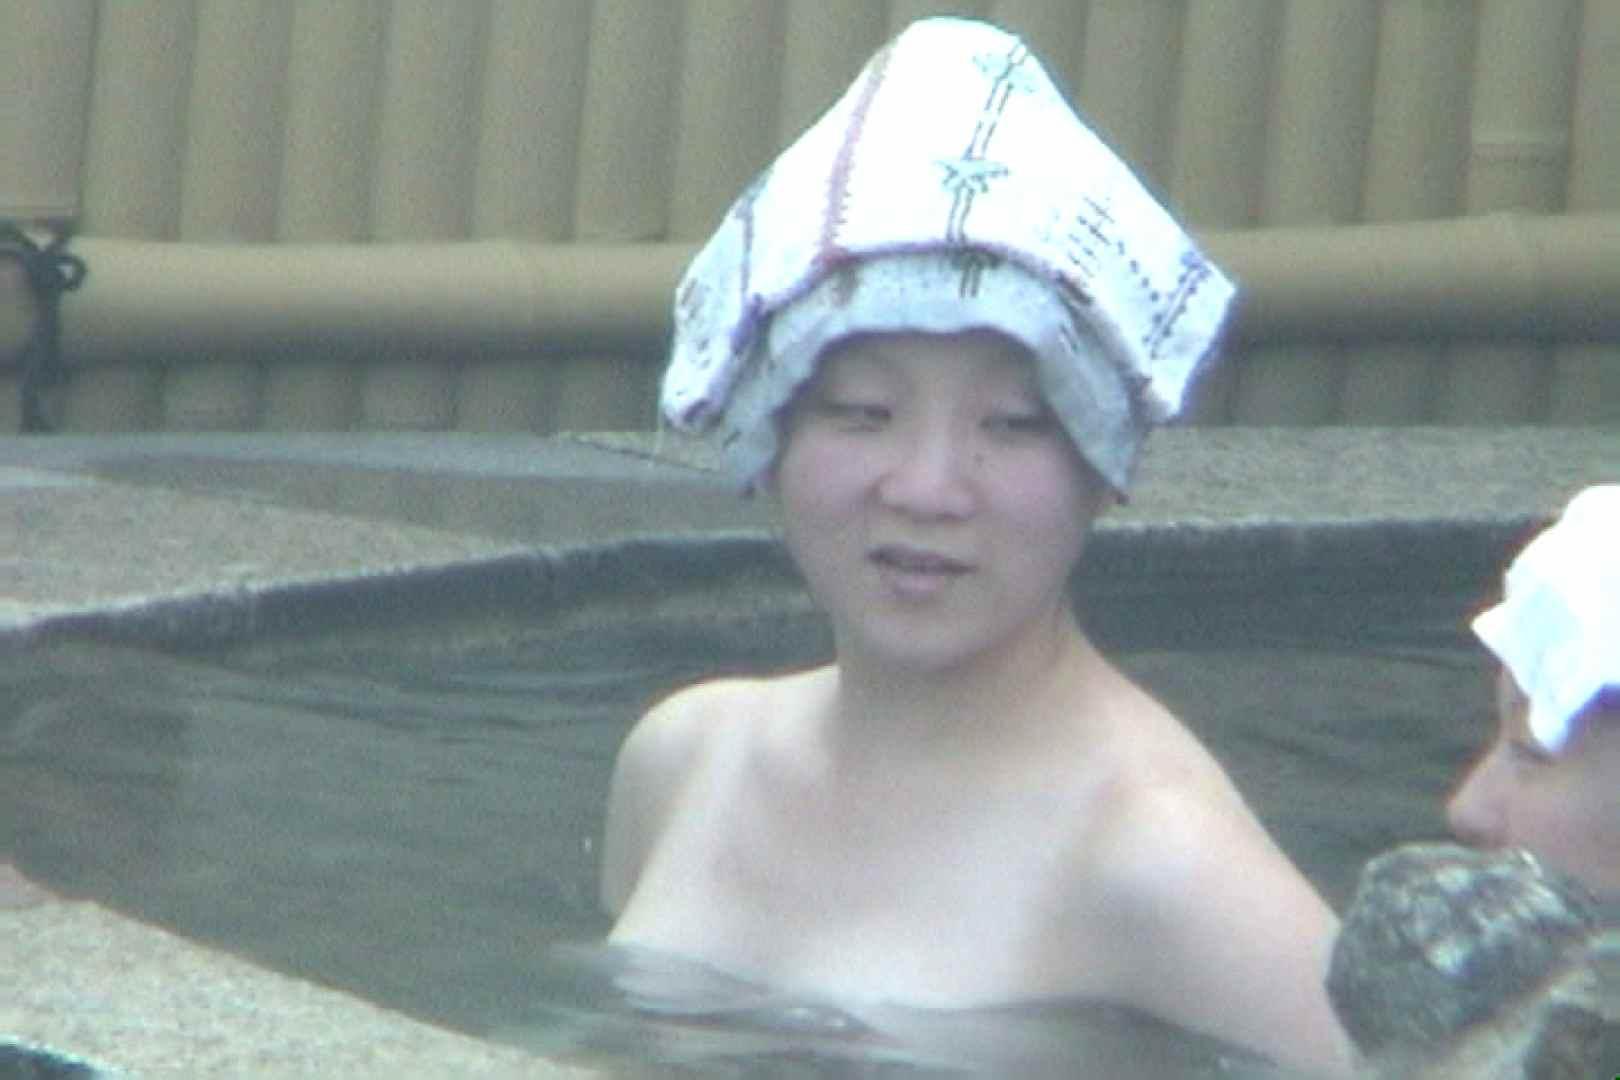 Aquaな露天風呂Vol.104 露天風呂突入 | 盗撮師作品  98pic 10